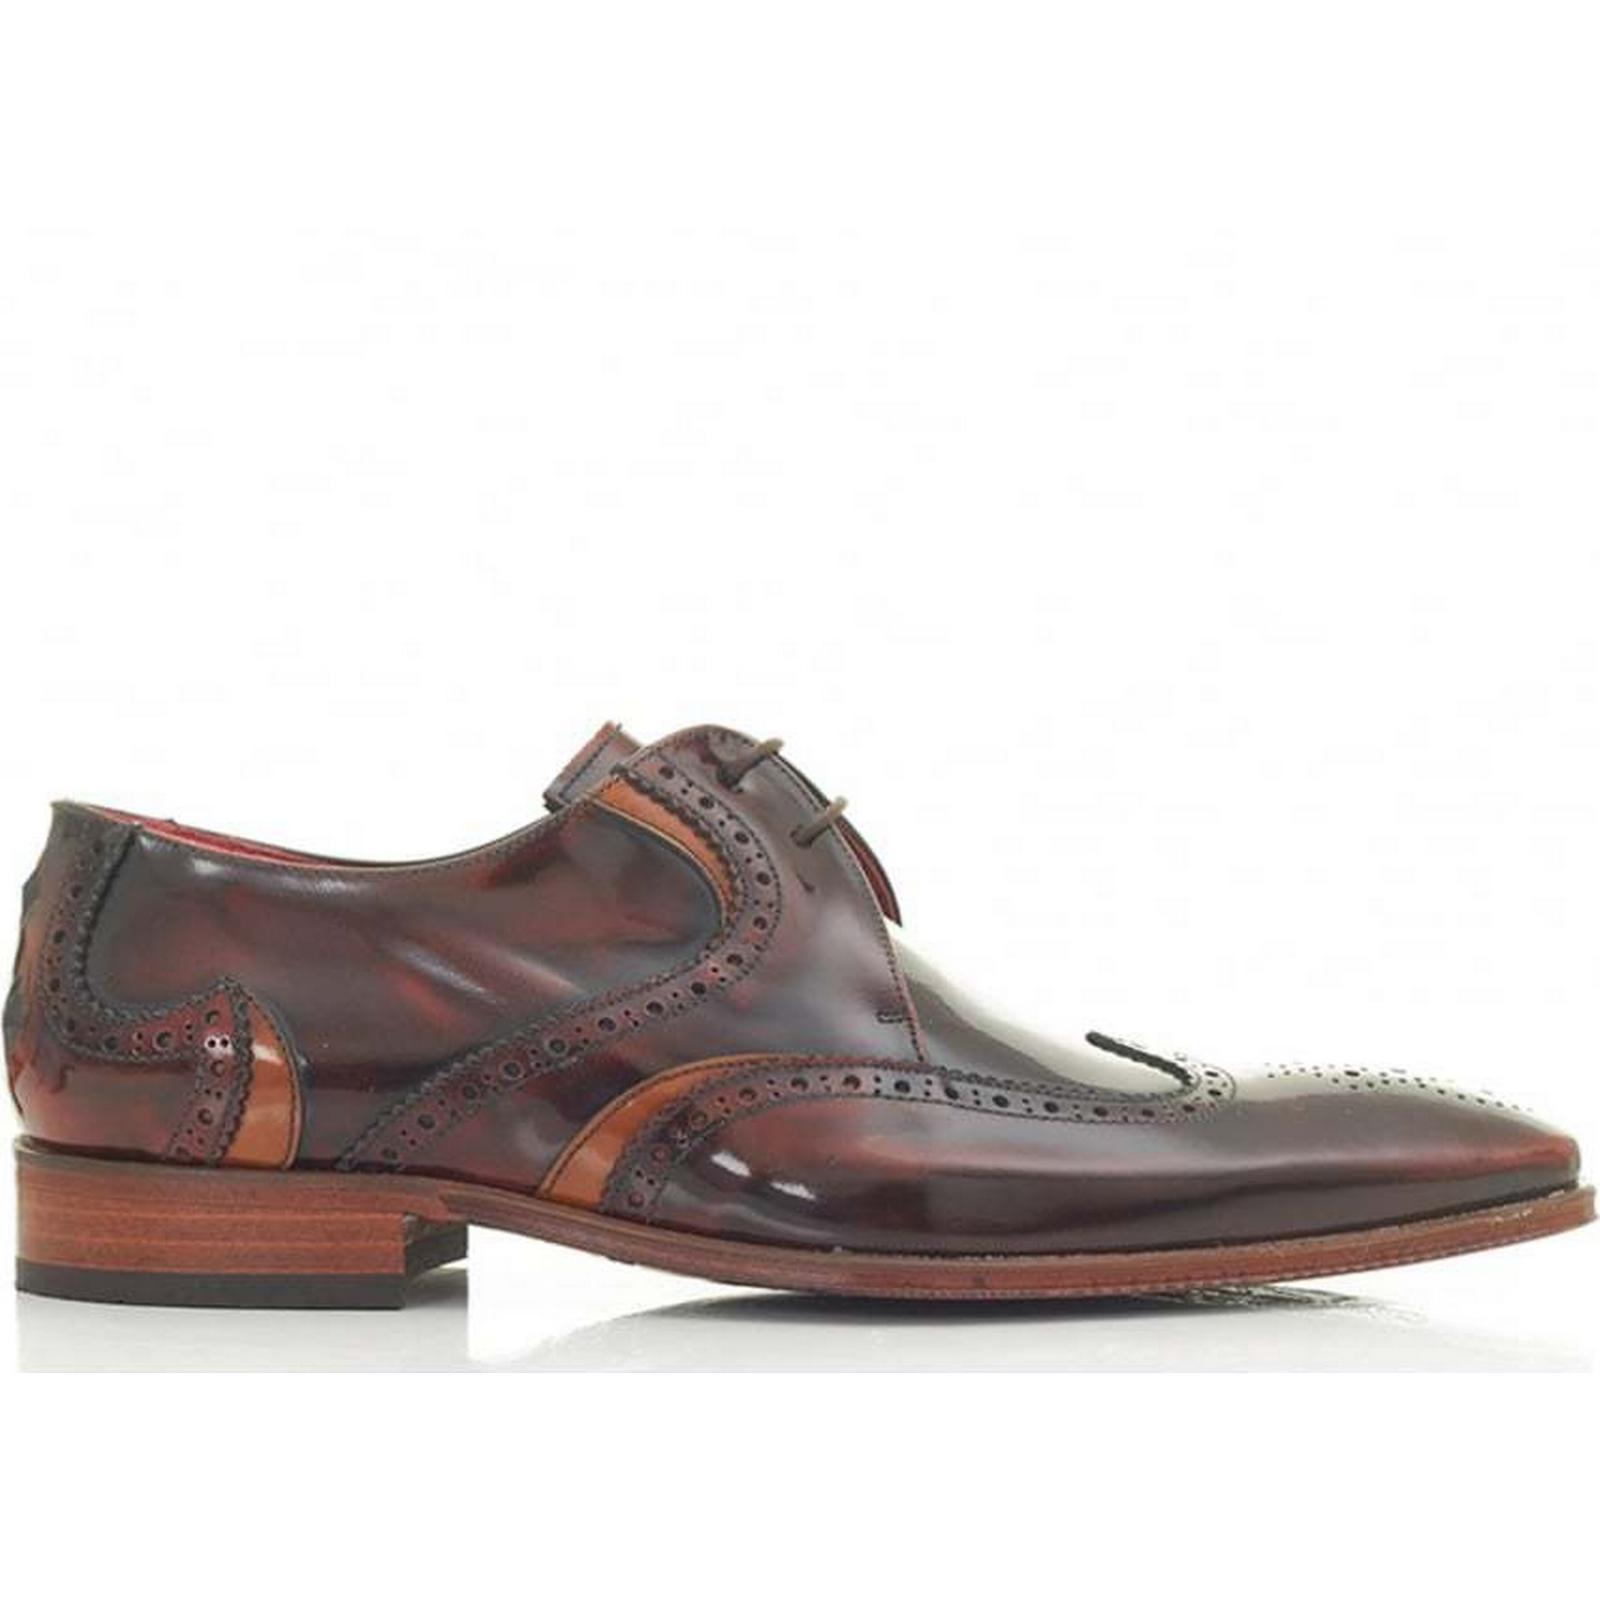 Jeffery West Museline Wingtip Size: Leather Shoes Colour: MID BROWN, Size: Wingtip 8 2898e3